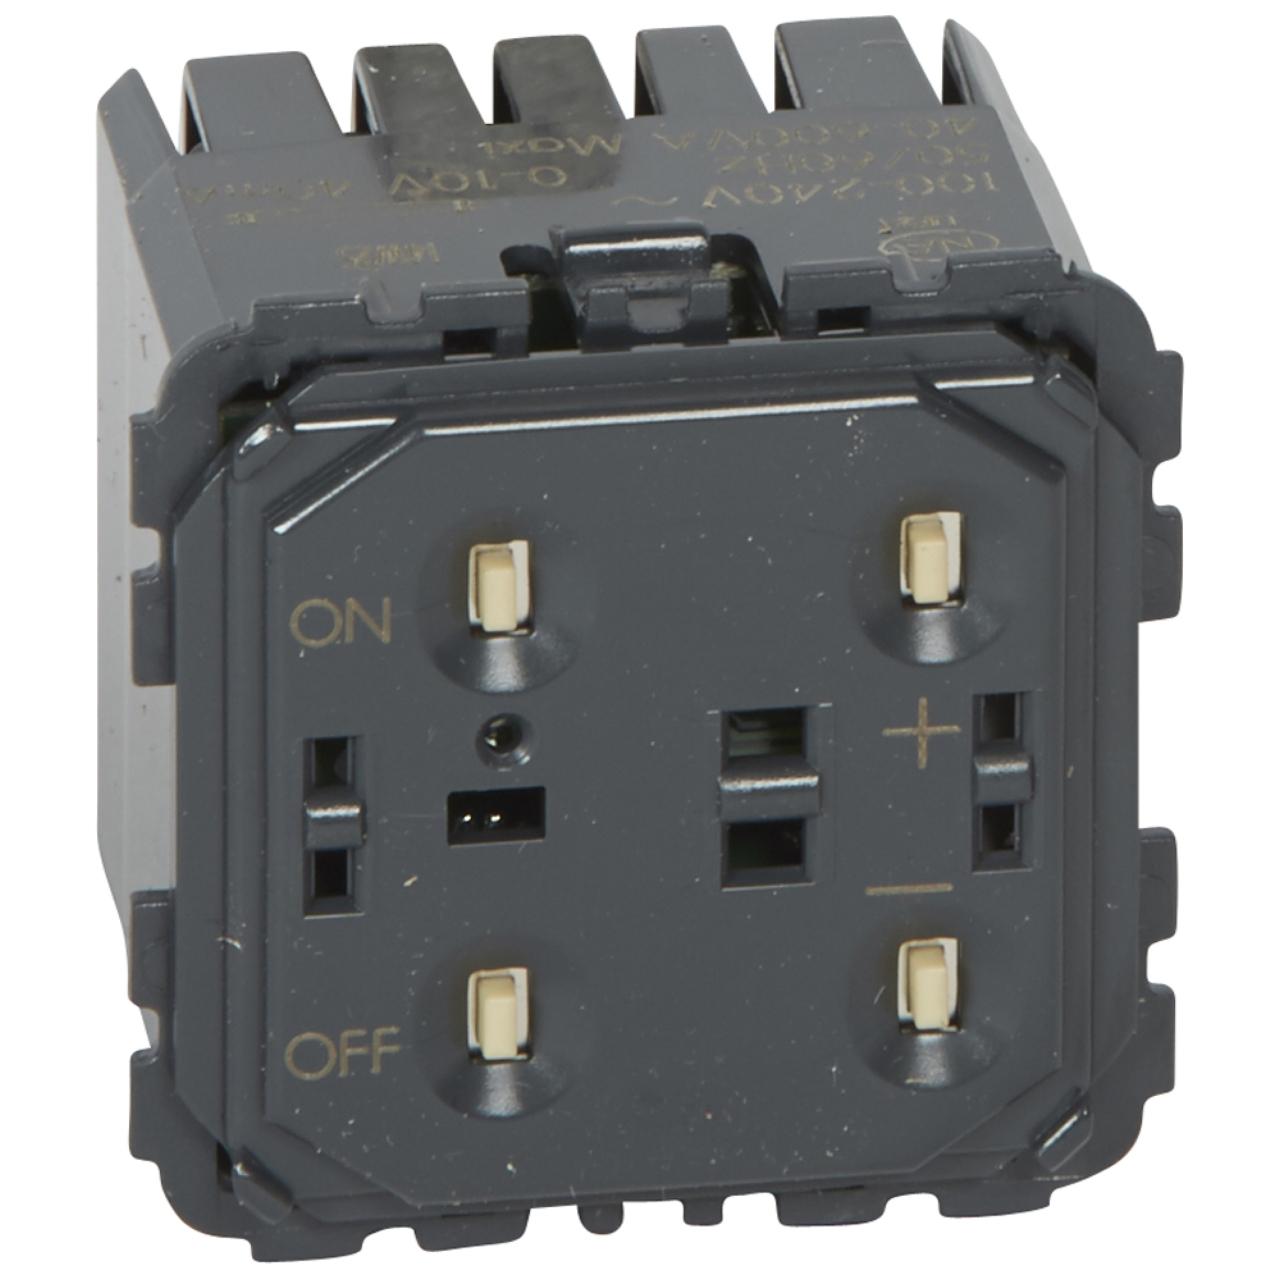 variateur interrupteur pour ballast 1 10v legrand c liane. Black Bedroom Furniture Sets. Home Design Ideas